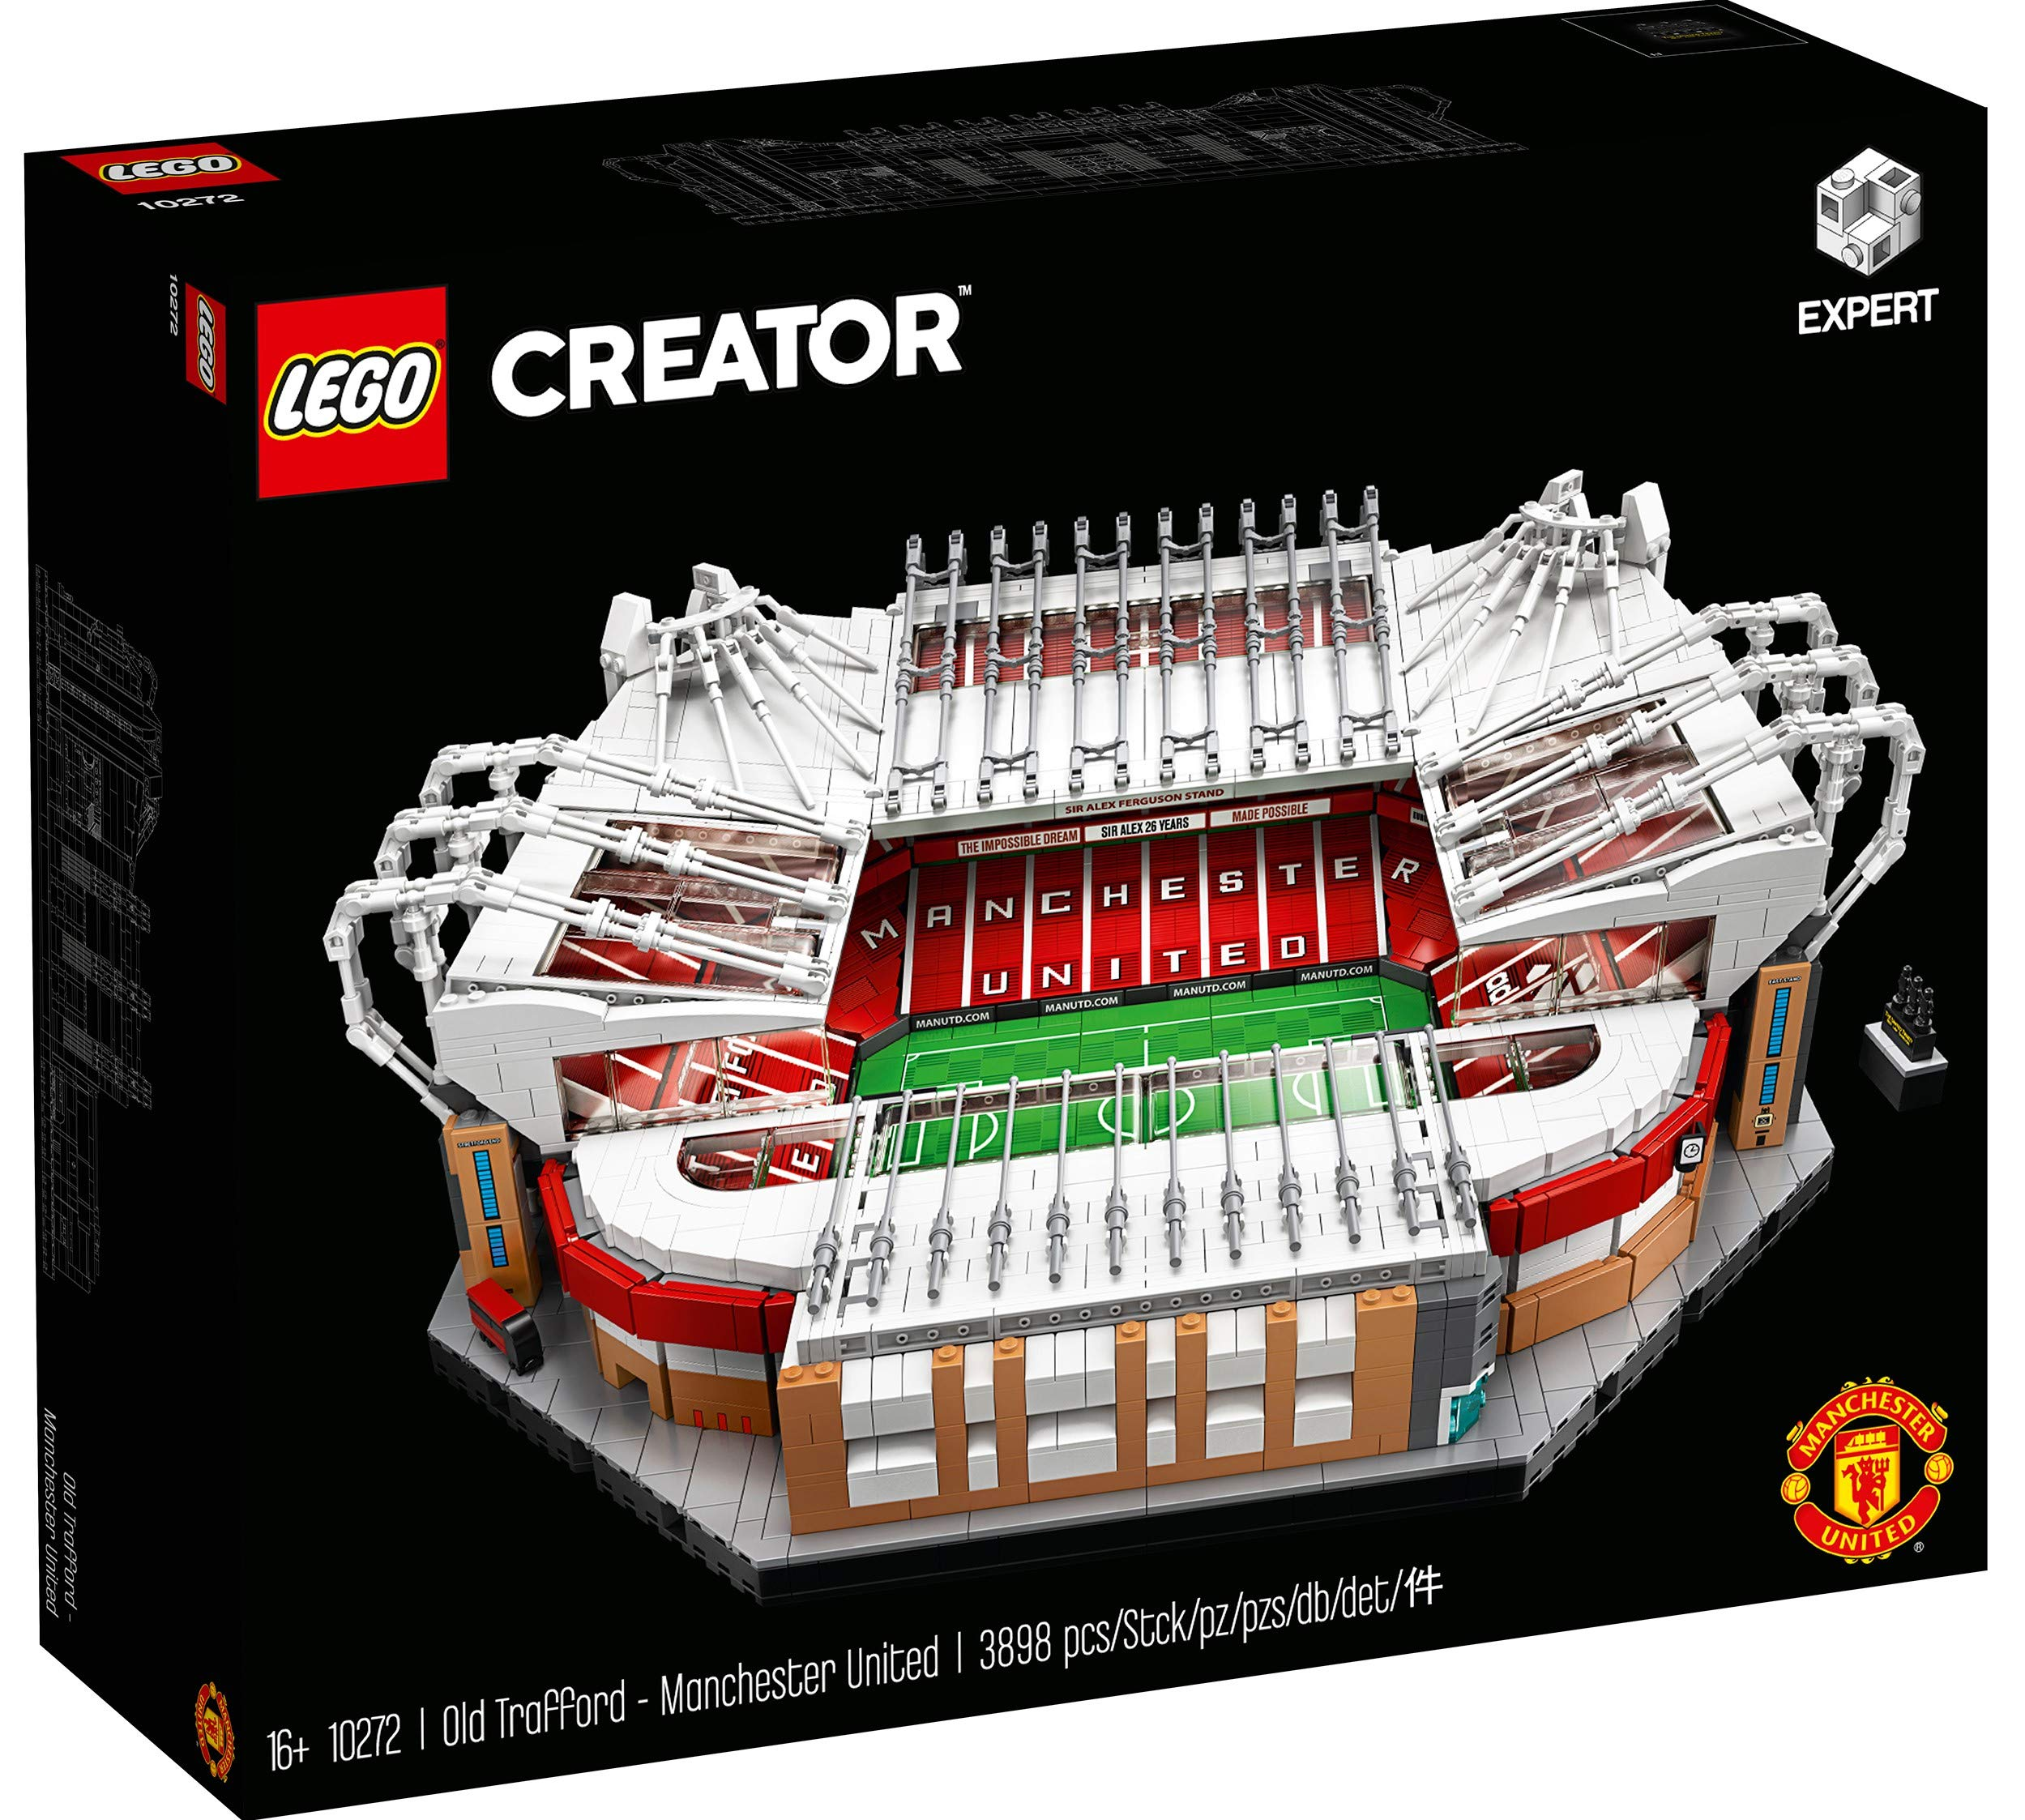 LEGO Creator Expert 10272 – Old Trafford – Manchester United